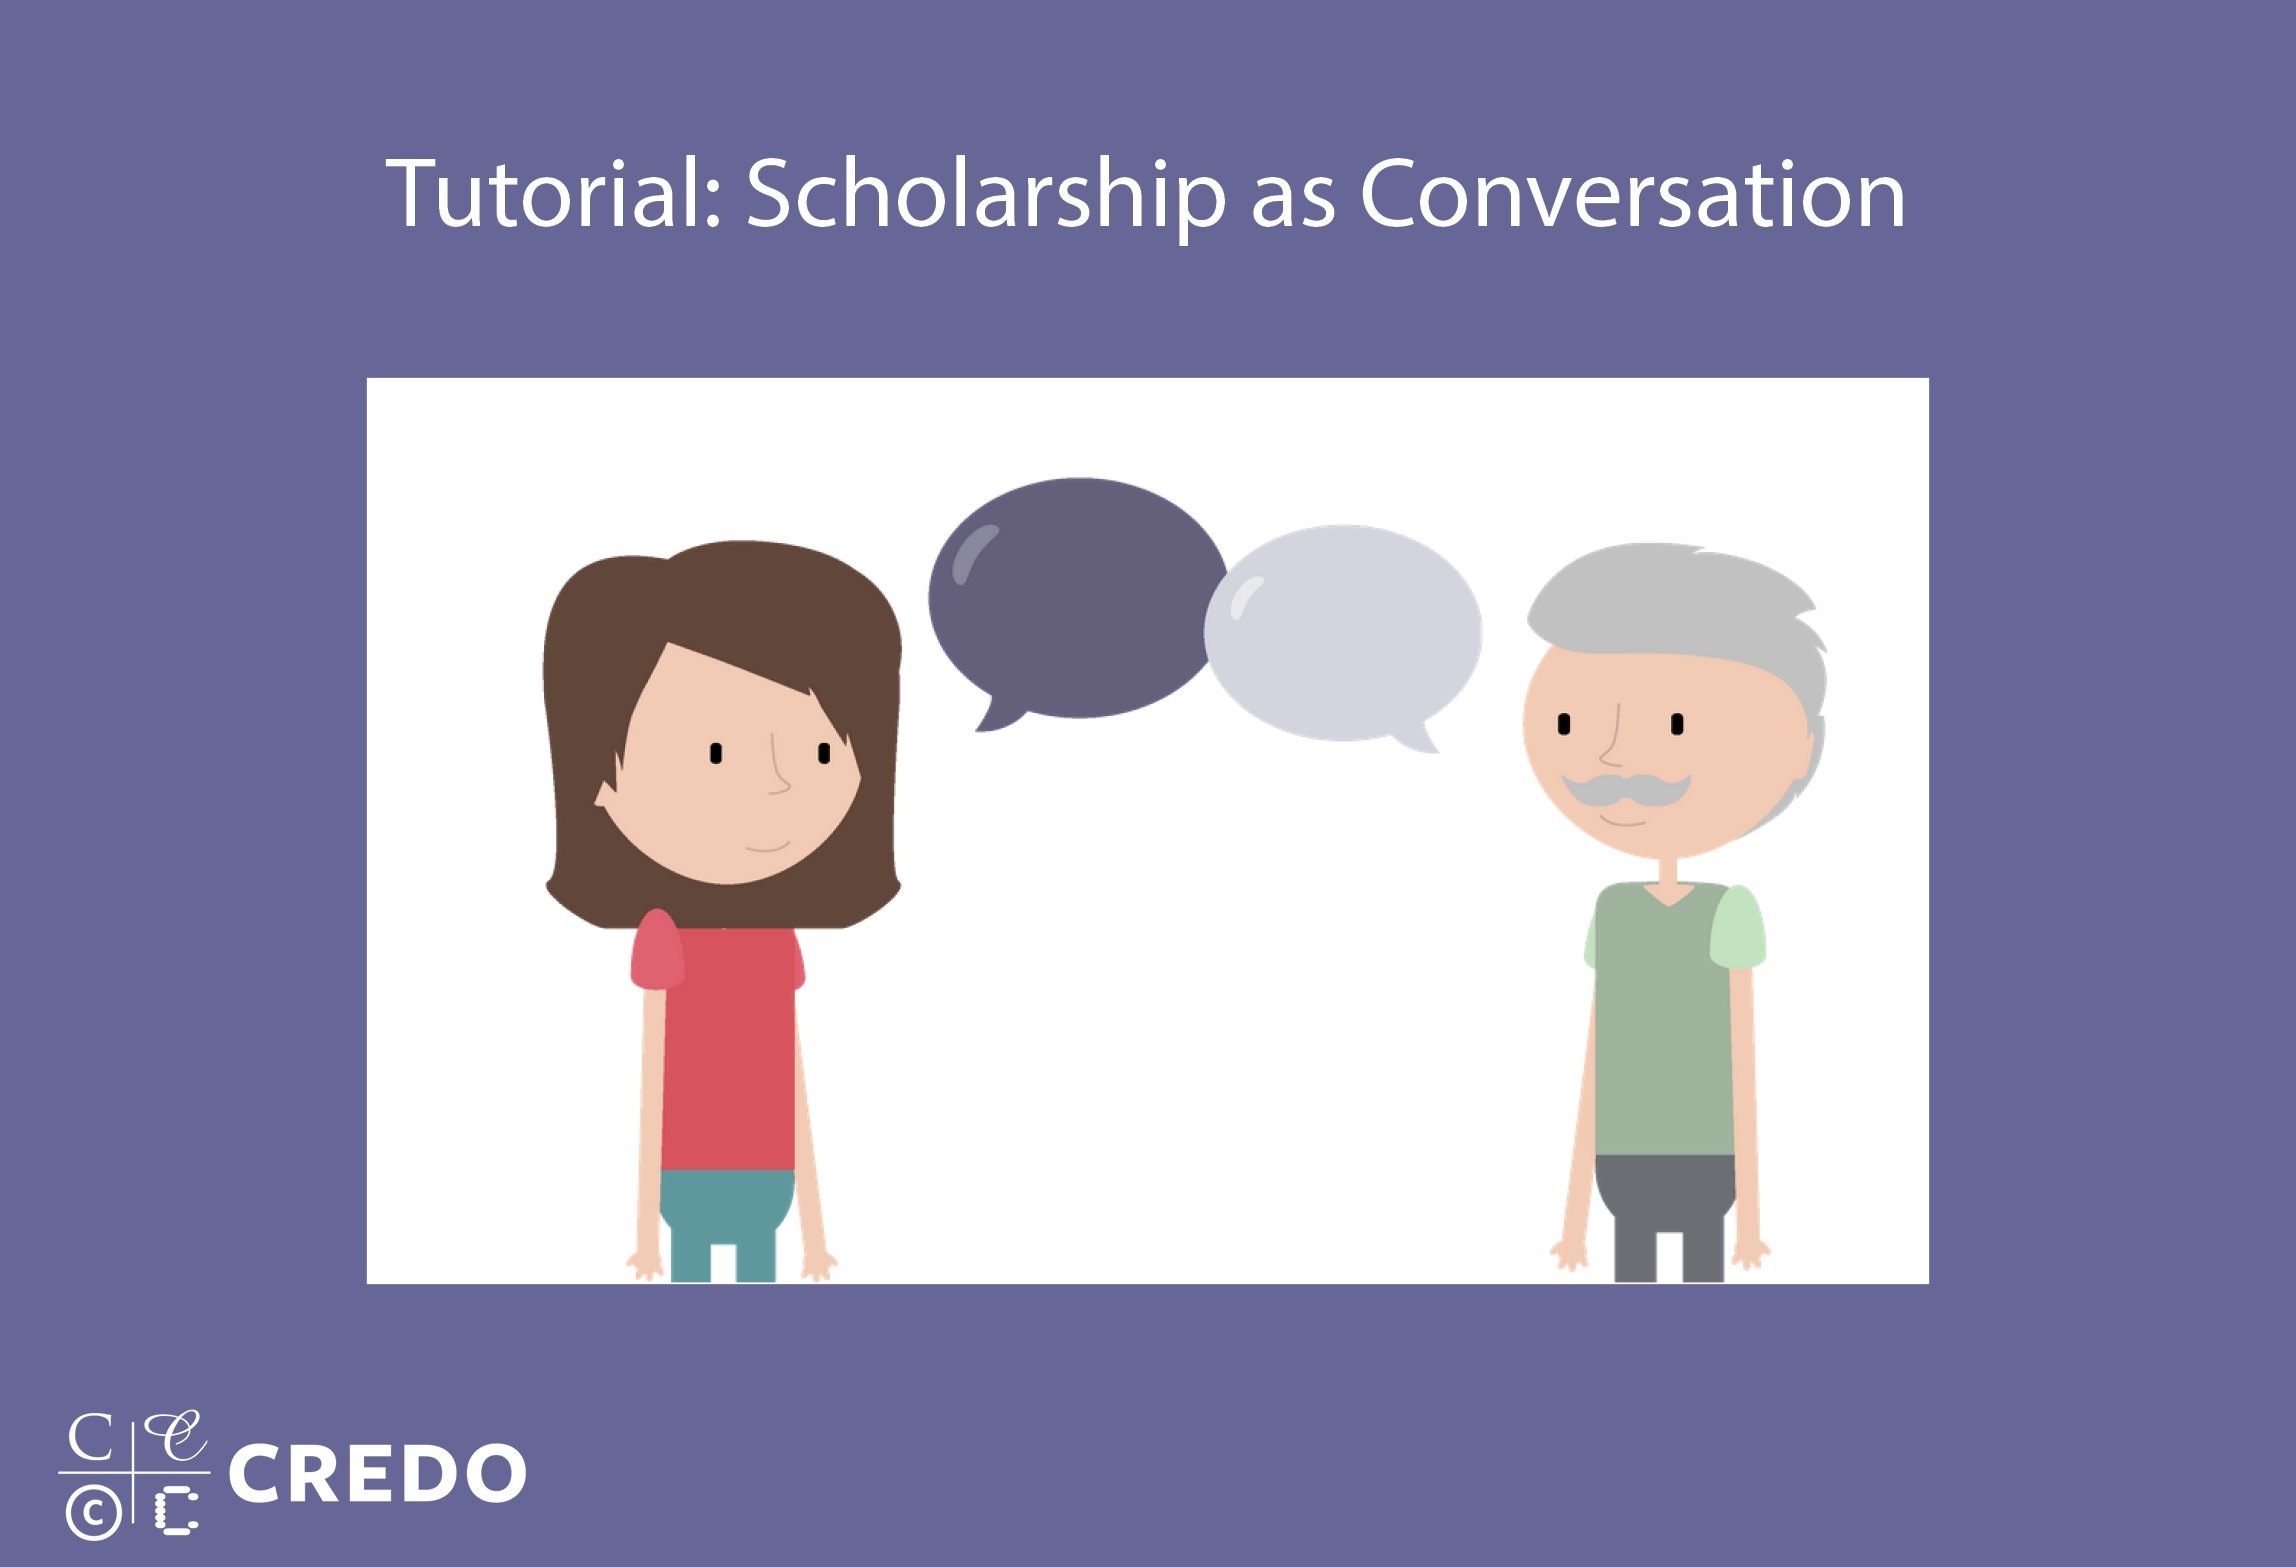 Tutorial: Scholarship as Conversation